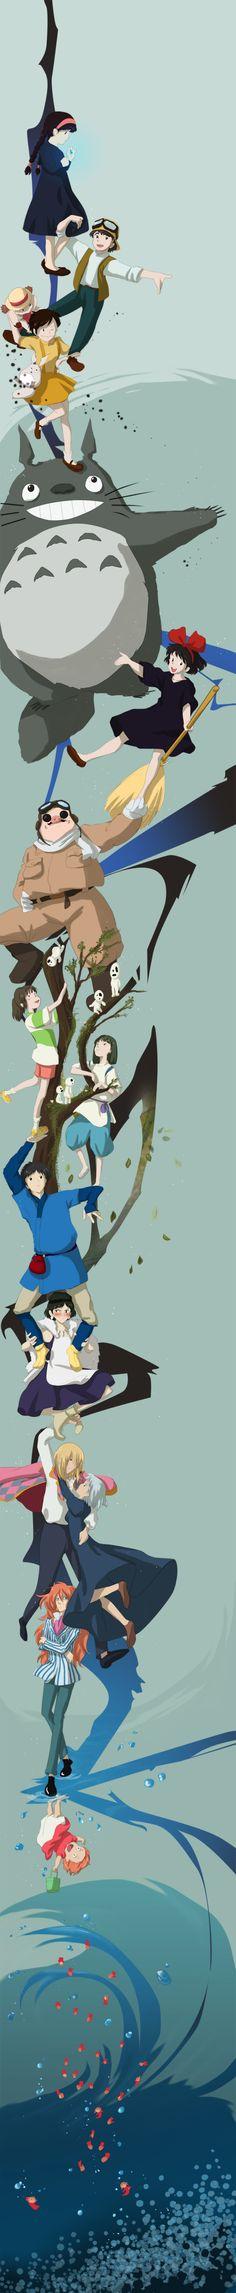 An Assortment of Amazing Studio Ghibli Inspired Art